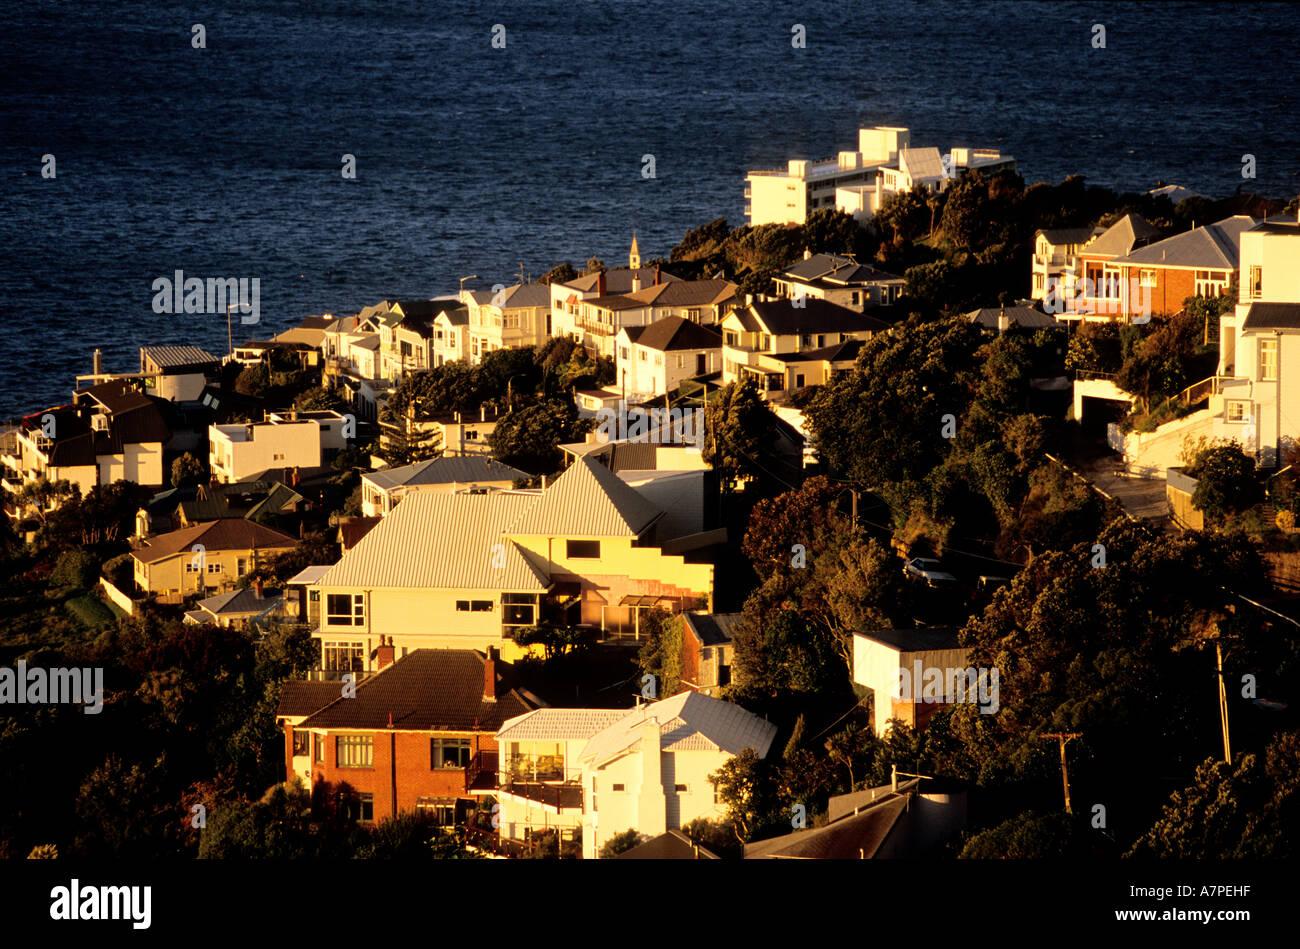 New Zealand, North Island, Wellington, residential neighbourhoods - Stock Image